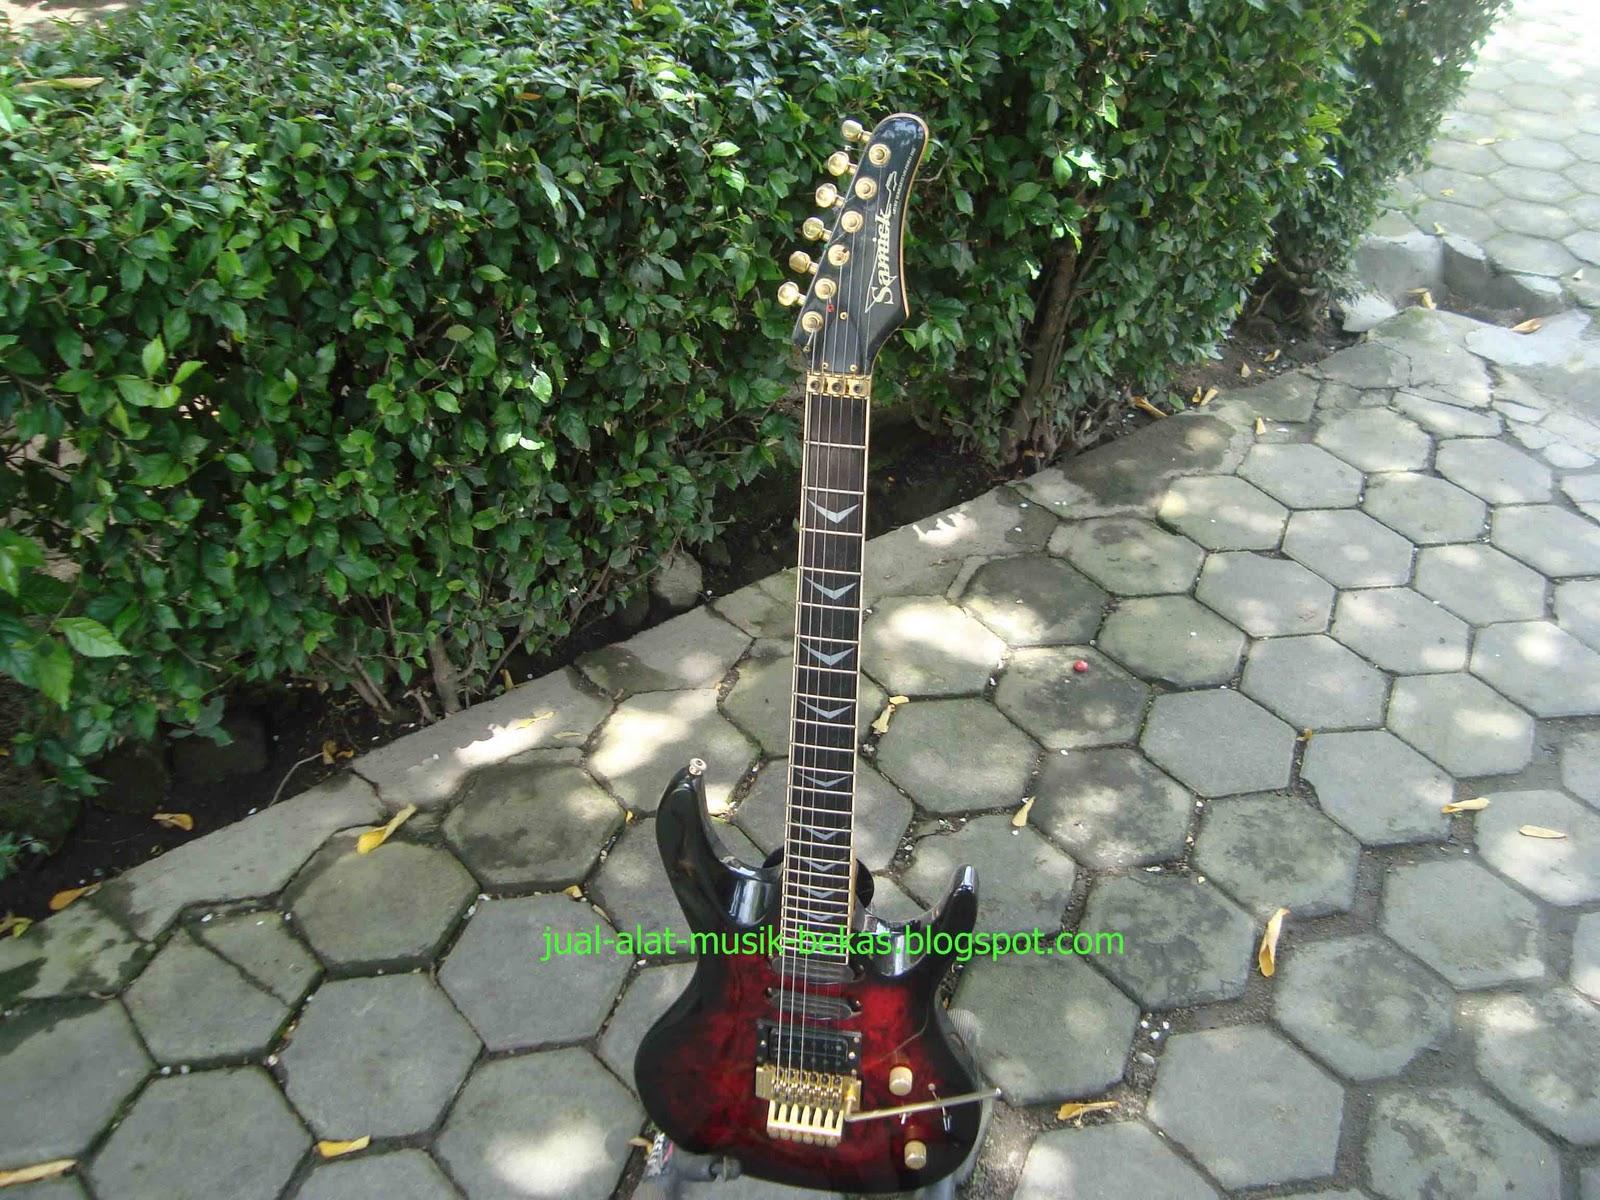 jual gitar di bandung seo makan